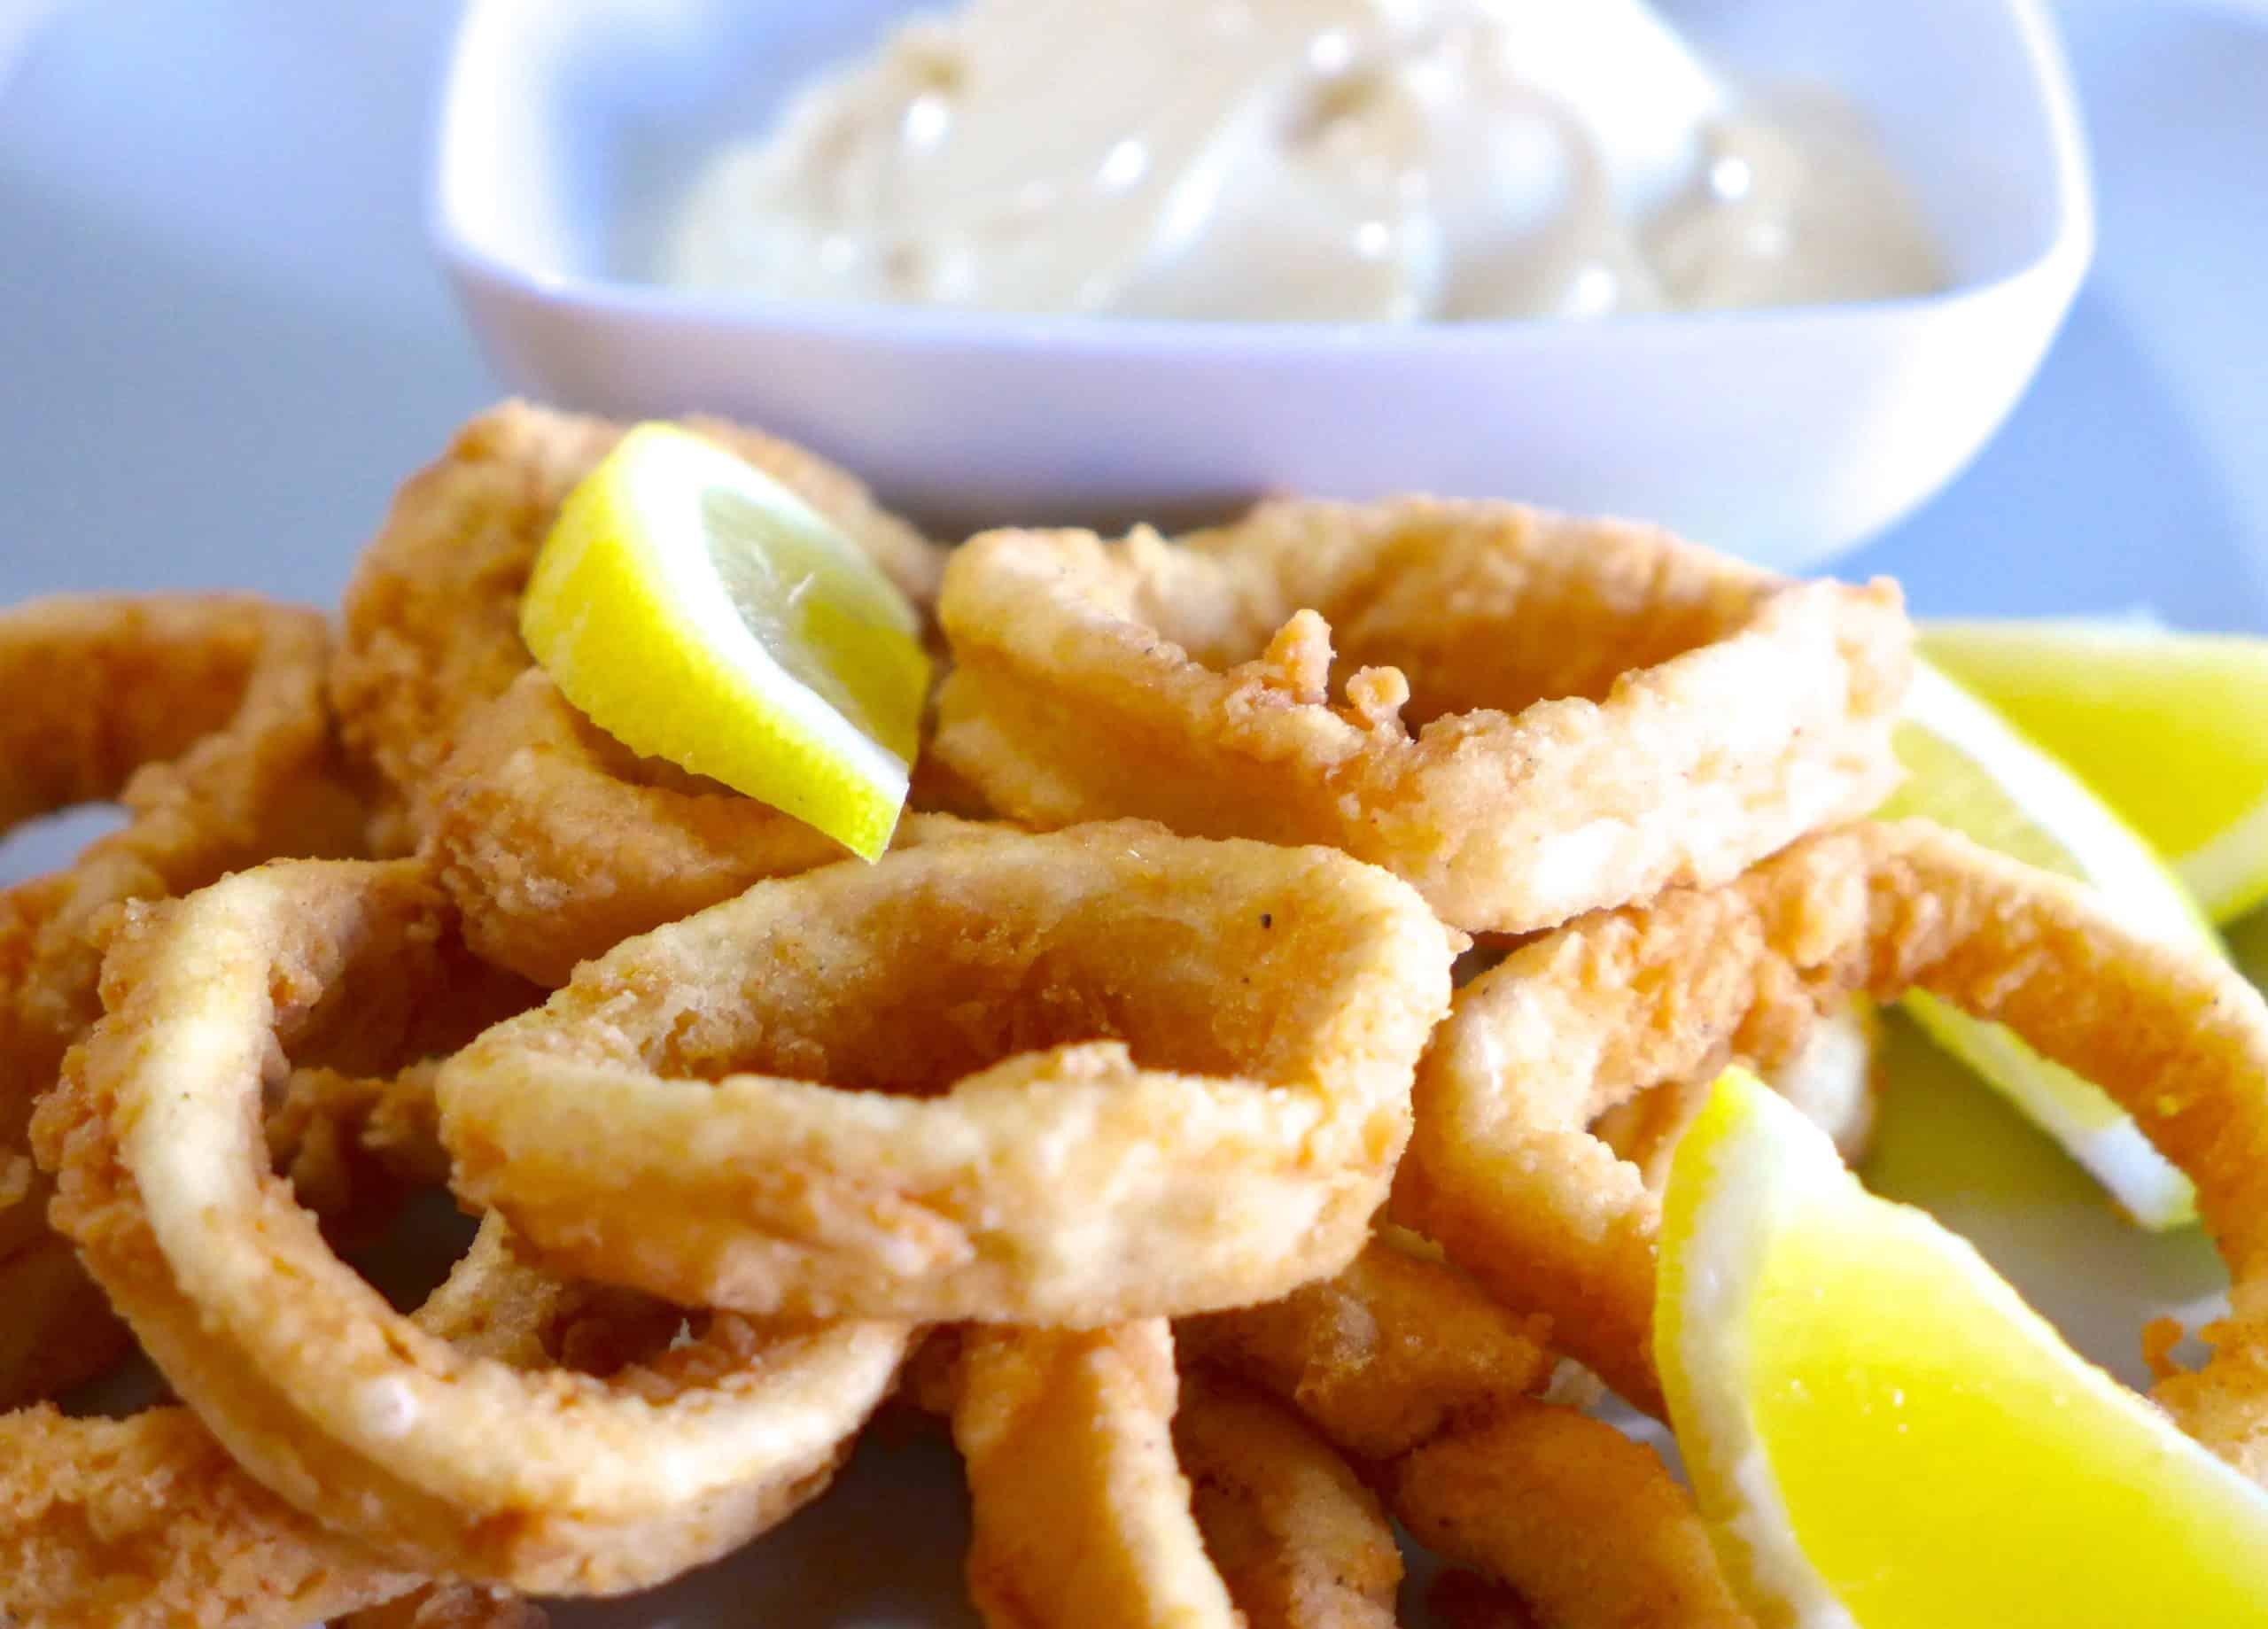 Crispy Fried Squid (Calamari) recipe (Kalamarakia Tiganita)